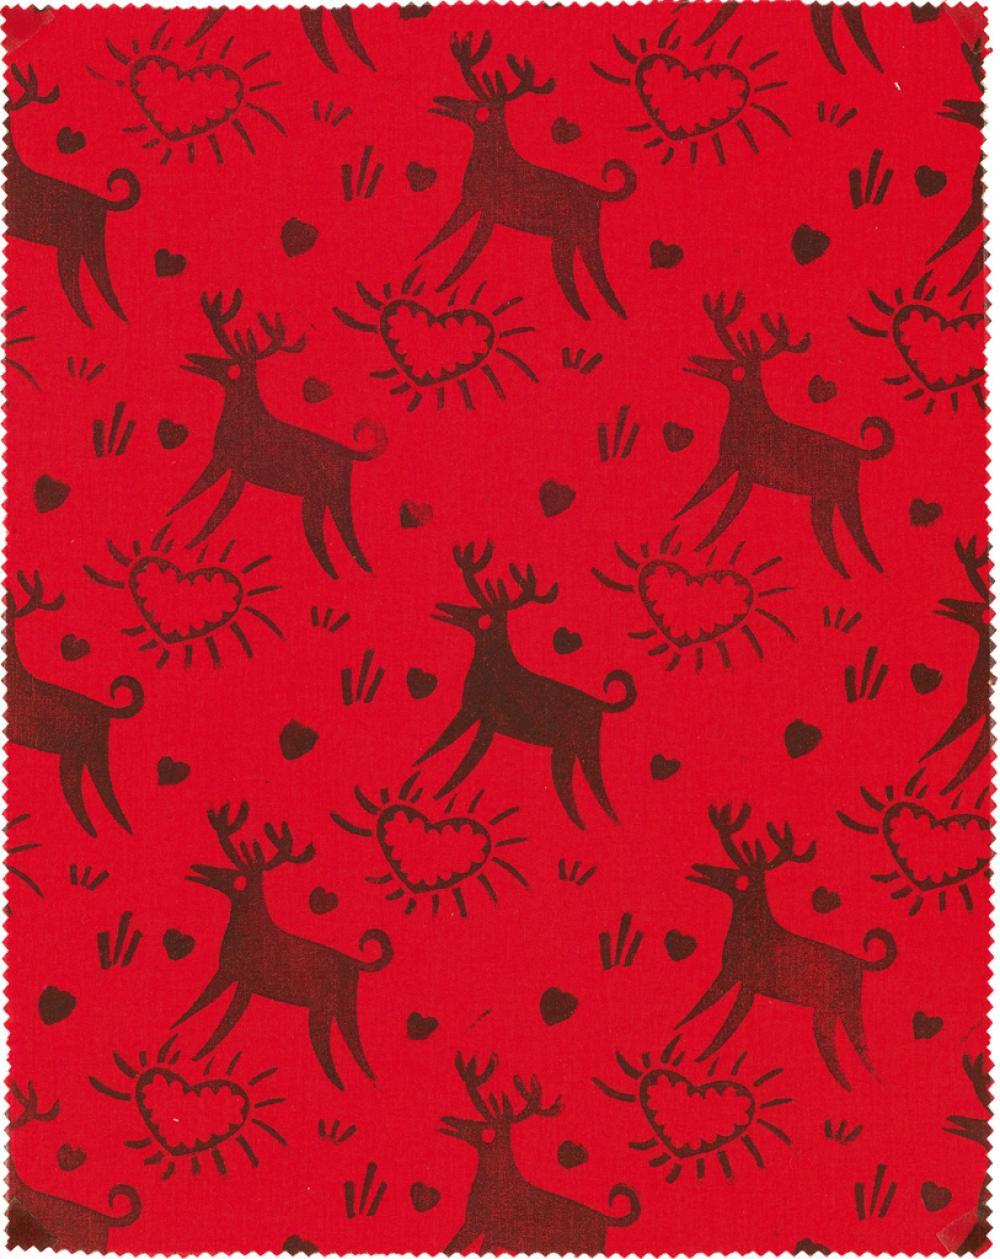 (DESIGN.) Milwaukee WPA Handicraft Project. Applied Design: Block Printed Textiles.